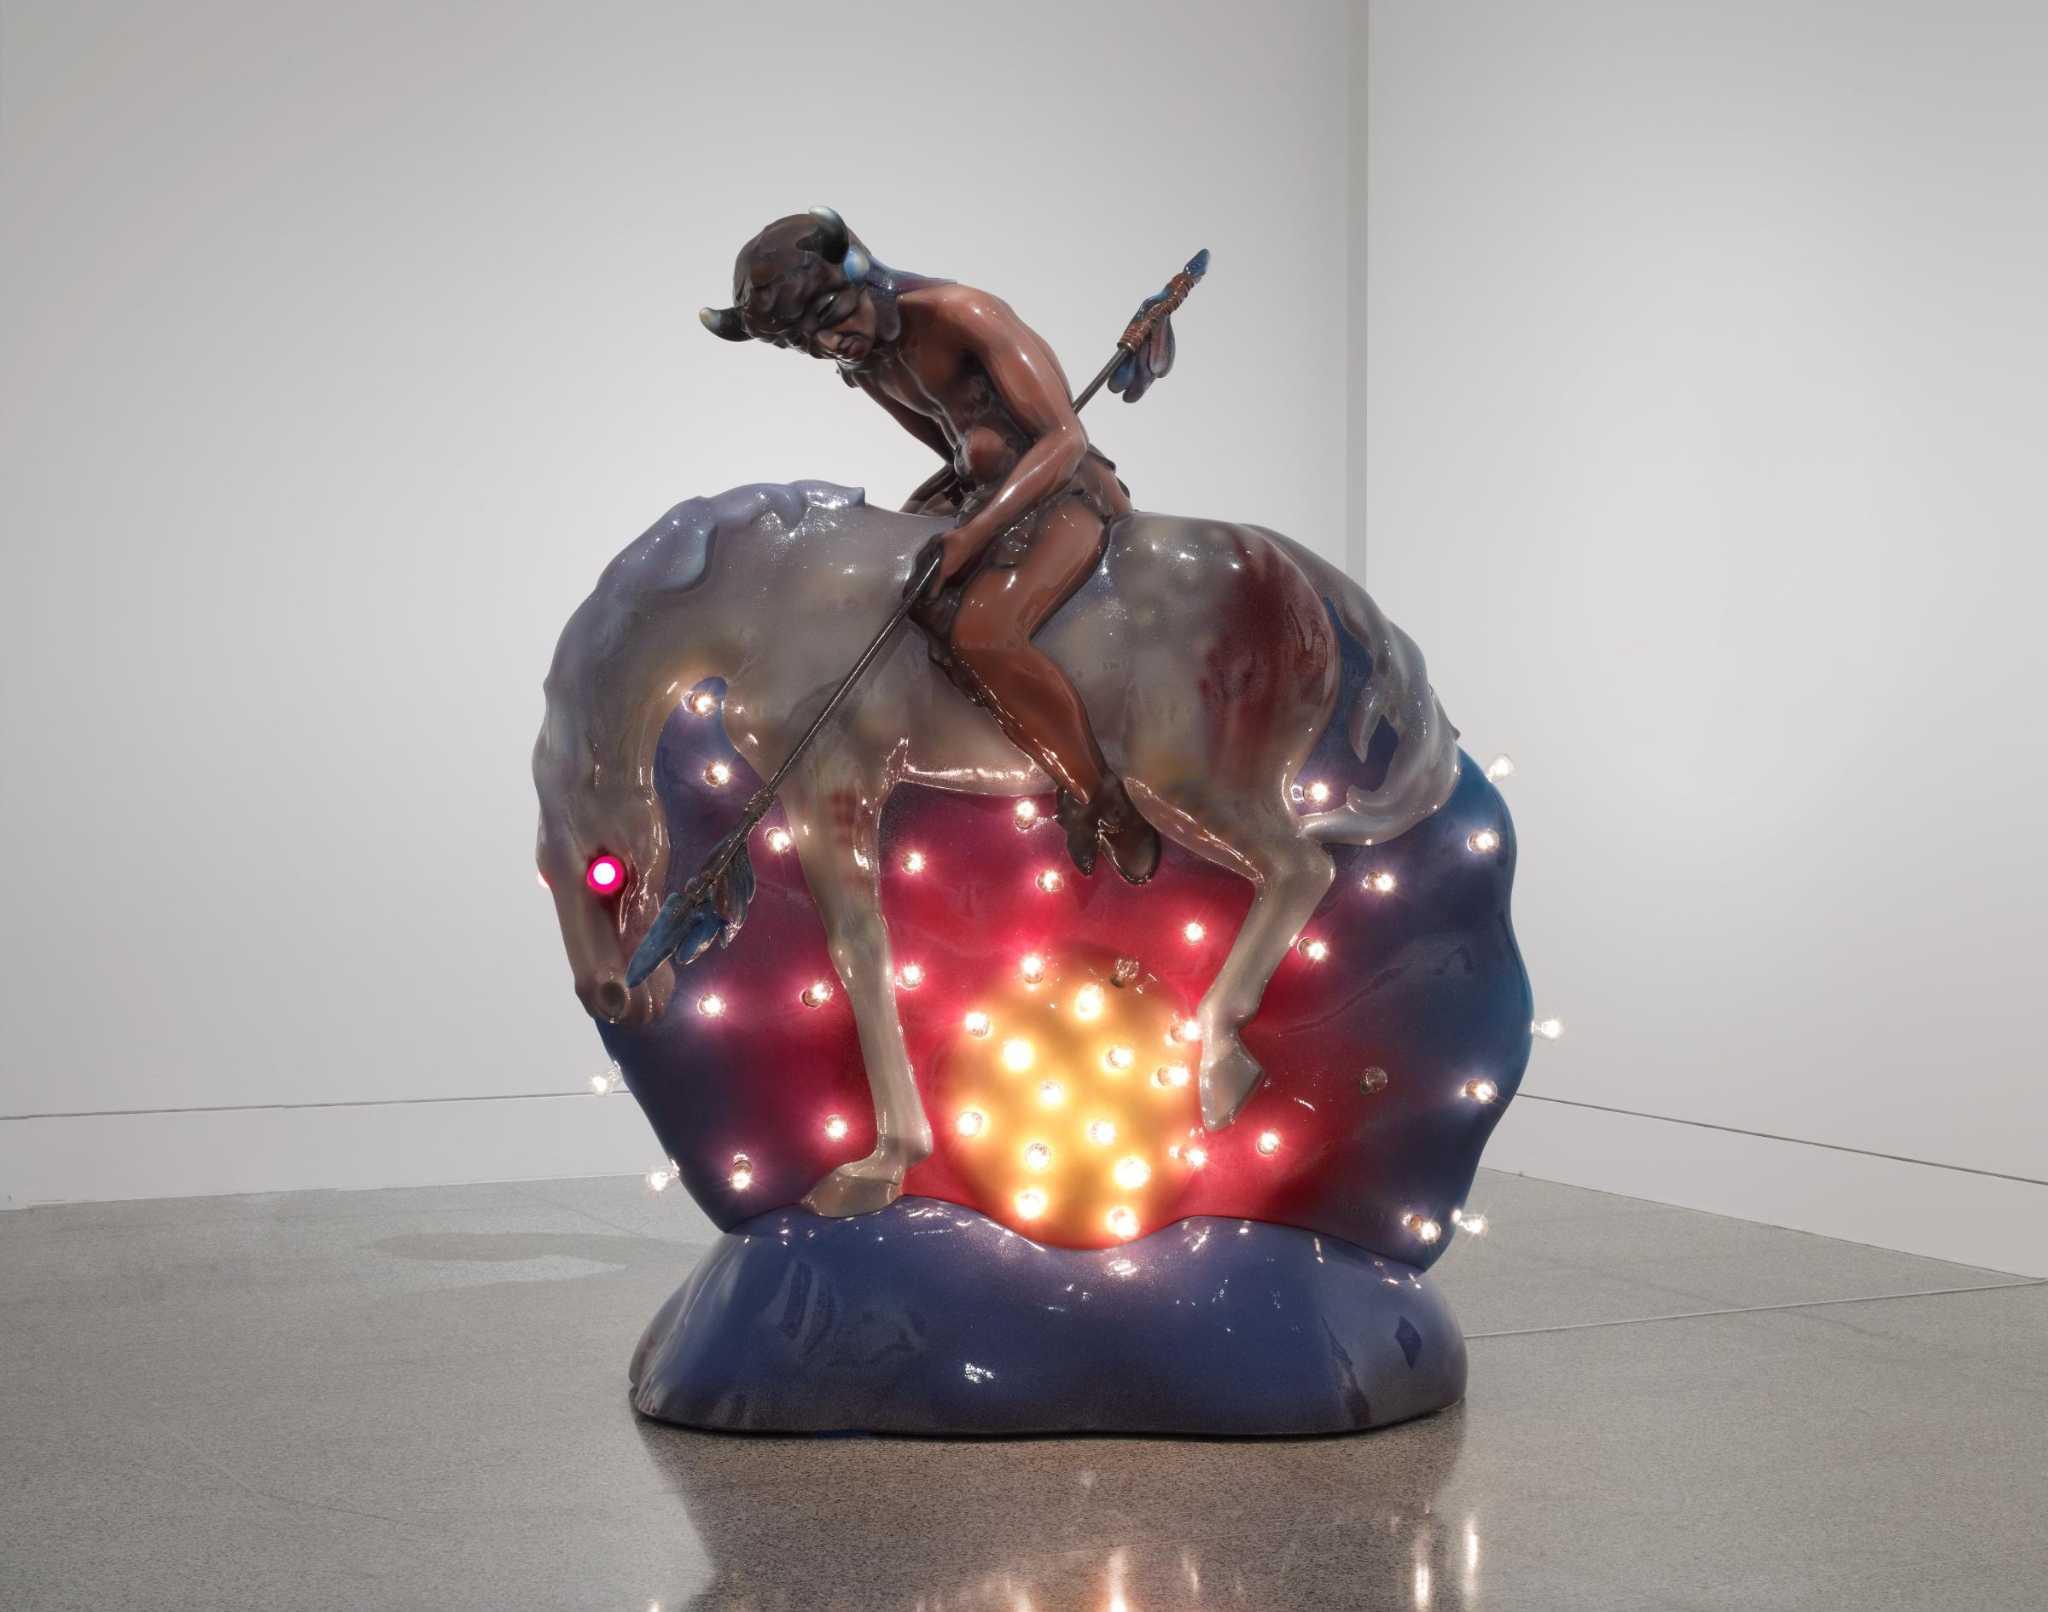 Art review: Luis Jimenez's electric 'End of the Trail' plugs into Pop Art